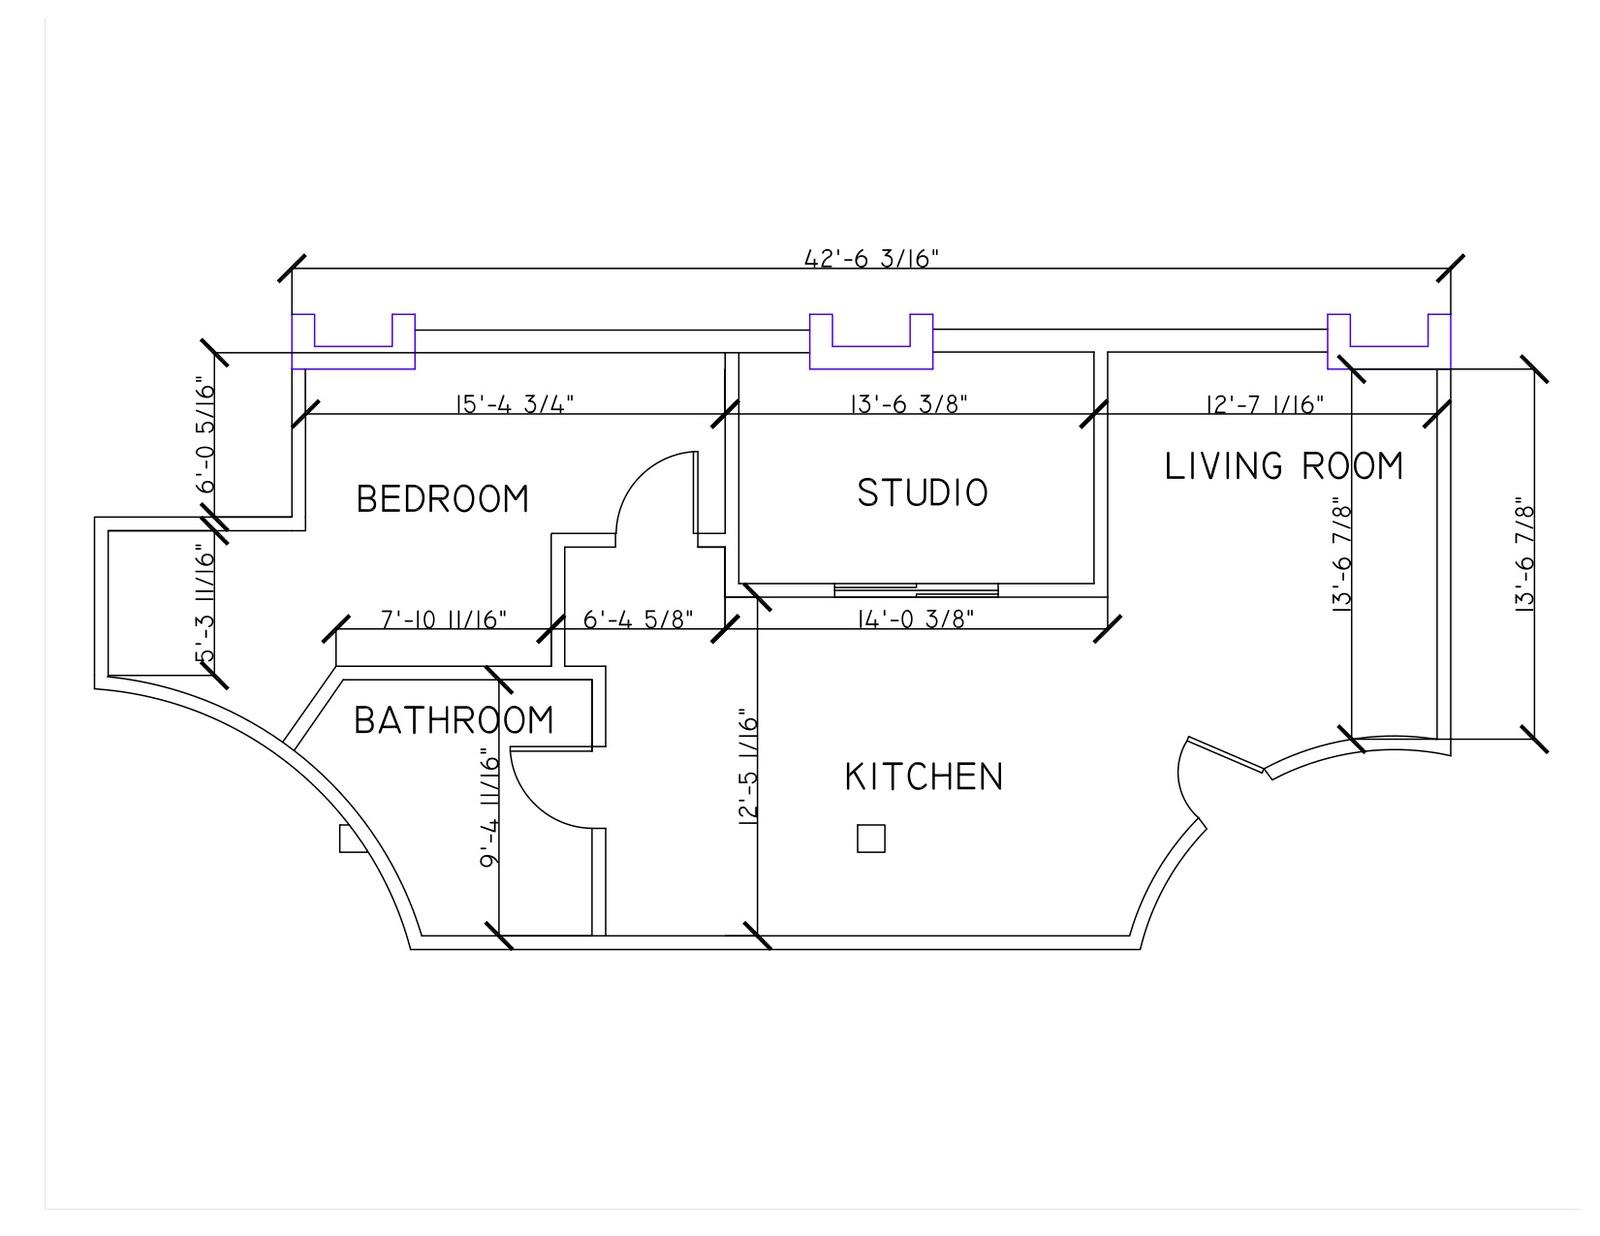 ino designs dimensioned floor plan commercial floor plans studio trend home design and decor